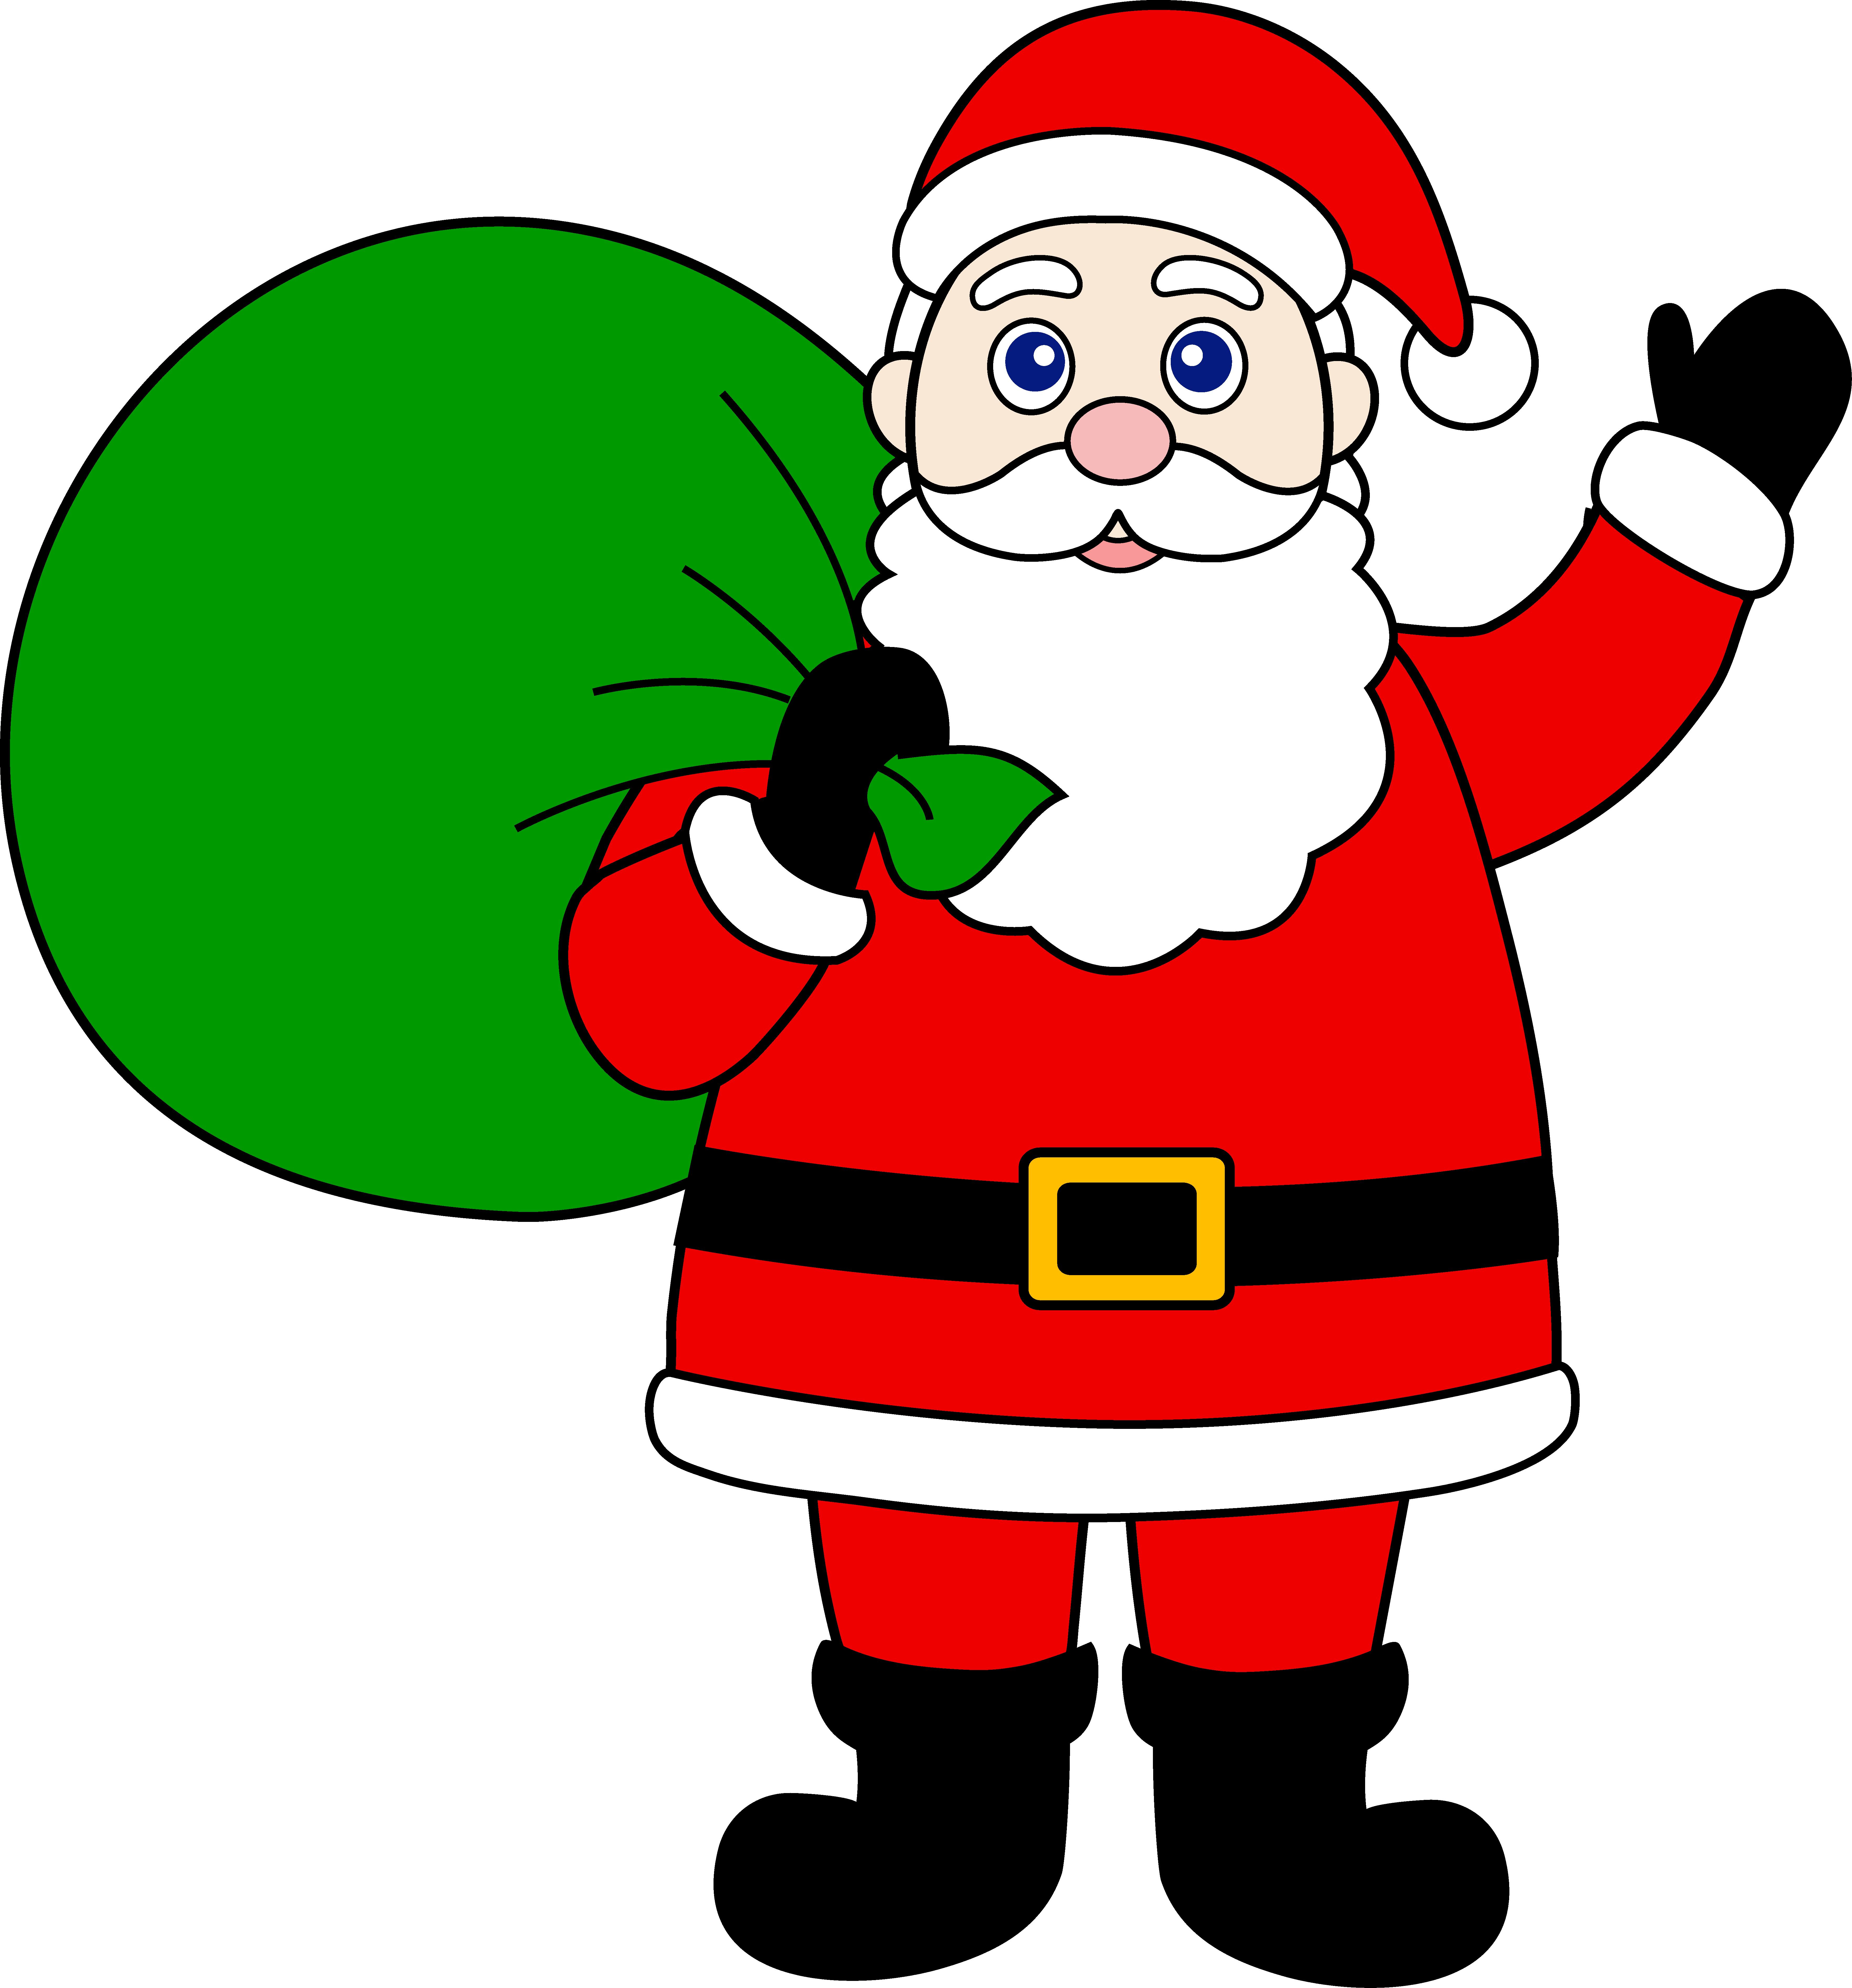 Santa Claus With Sack Of Gifts - Free Cl-Santa Claus With Sack of Gifts - Free Clip Art-16